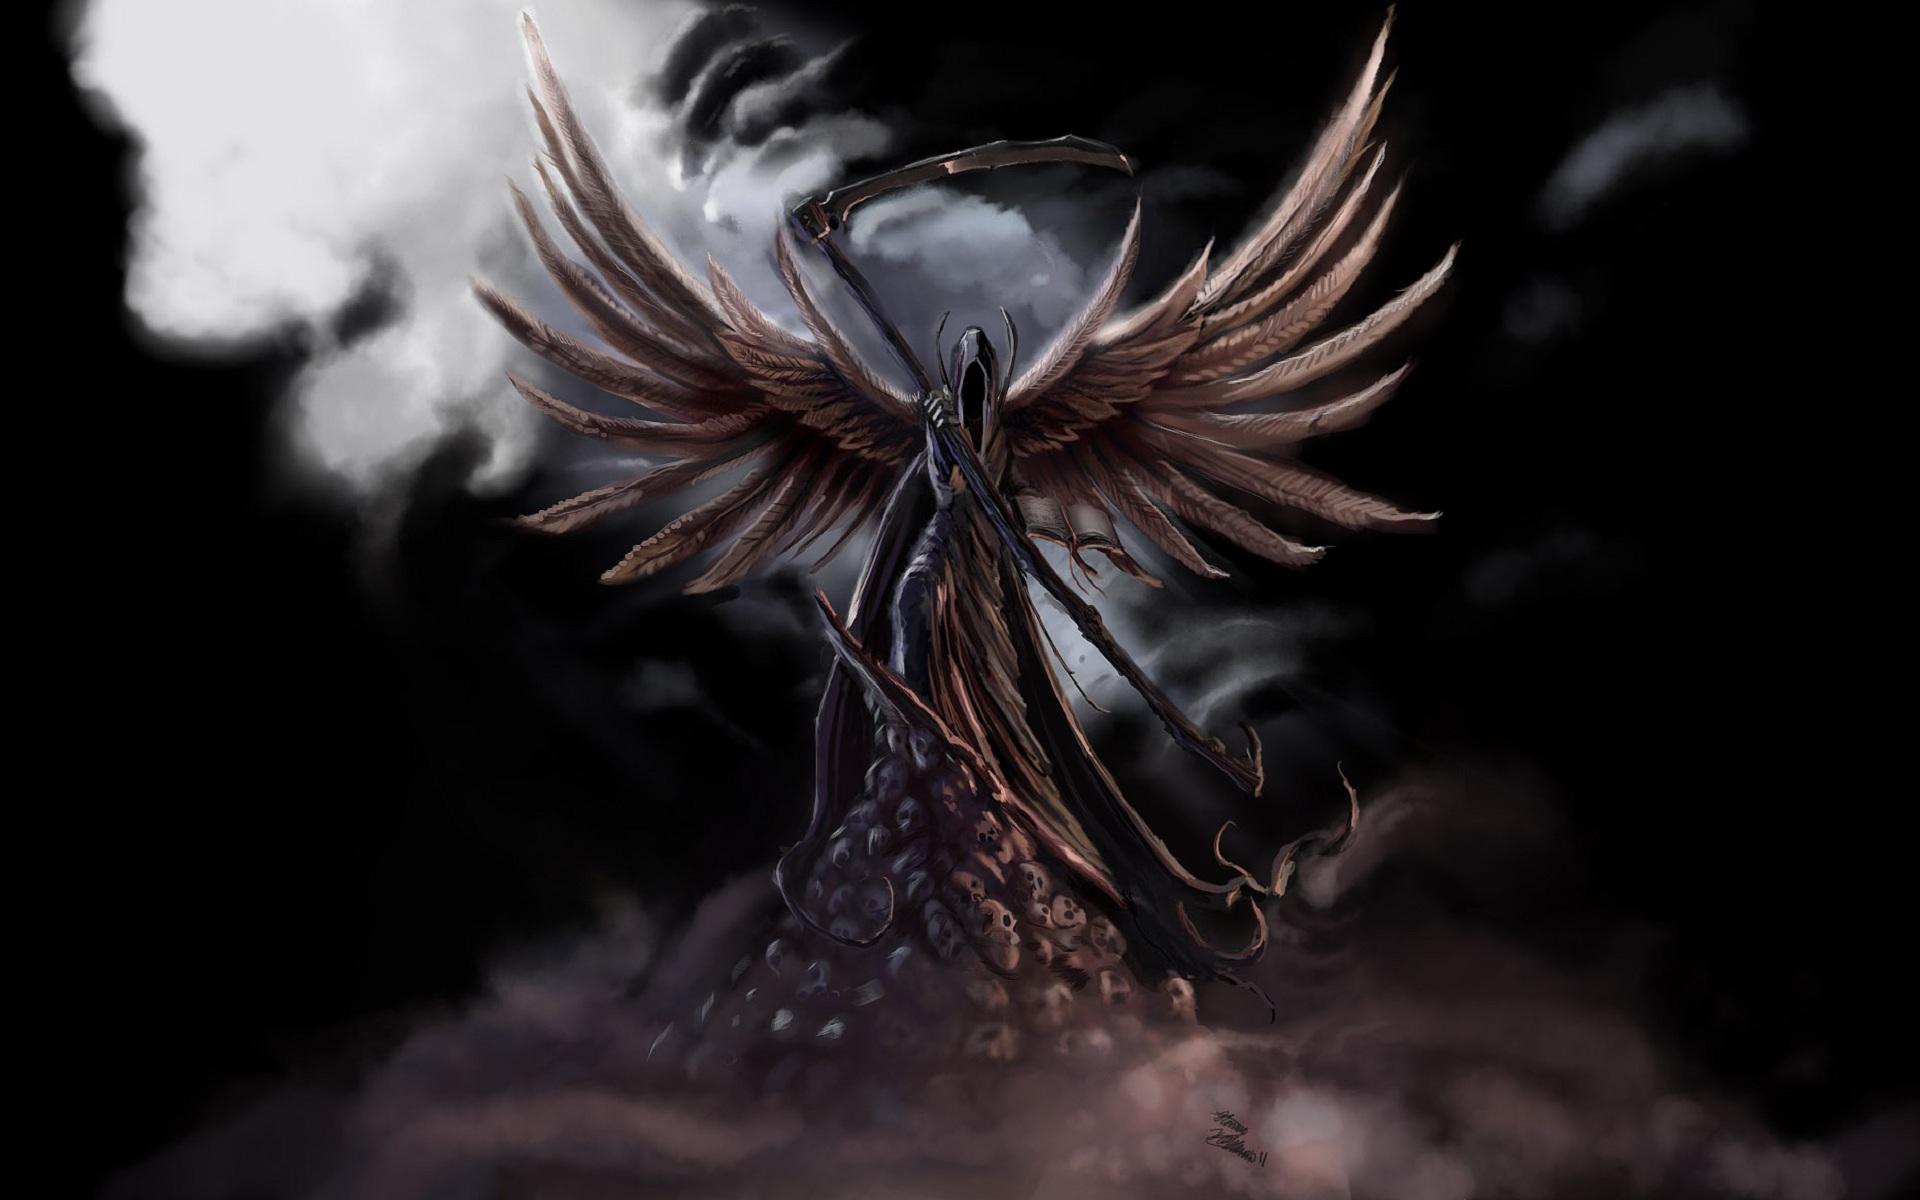 Drawn grim reaper angel wing With Wings creepy wallpaper wings